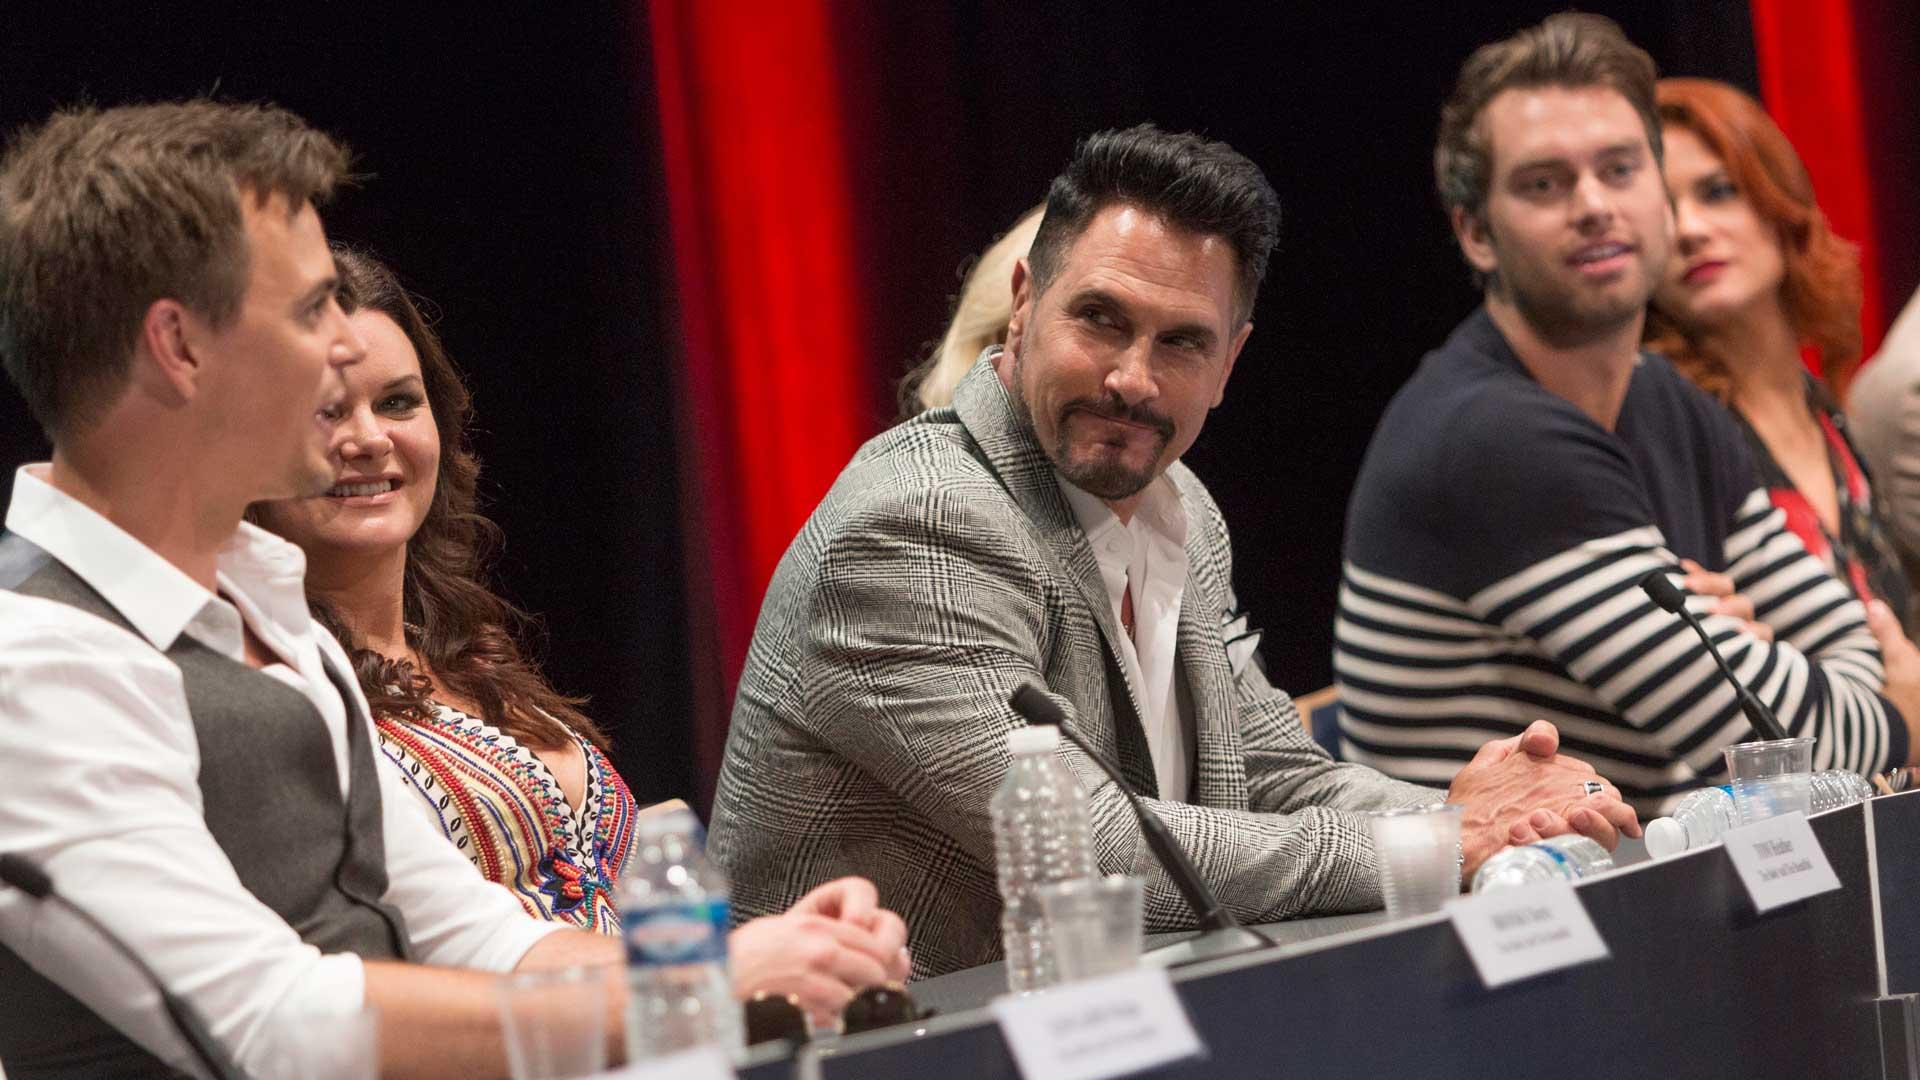 Members of the B&B cast field fan questions at the Grimaldi Forum.